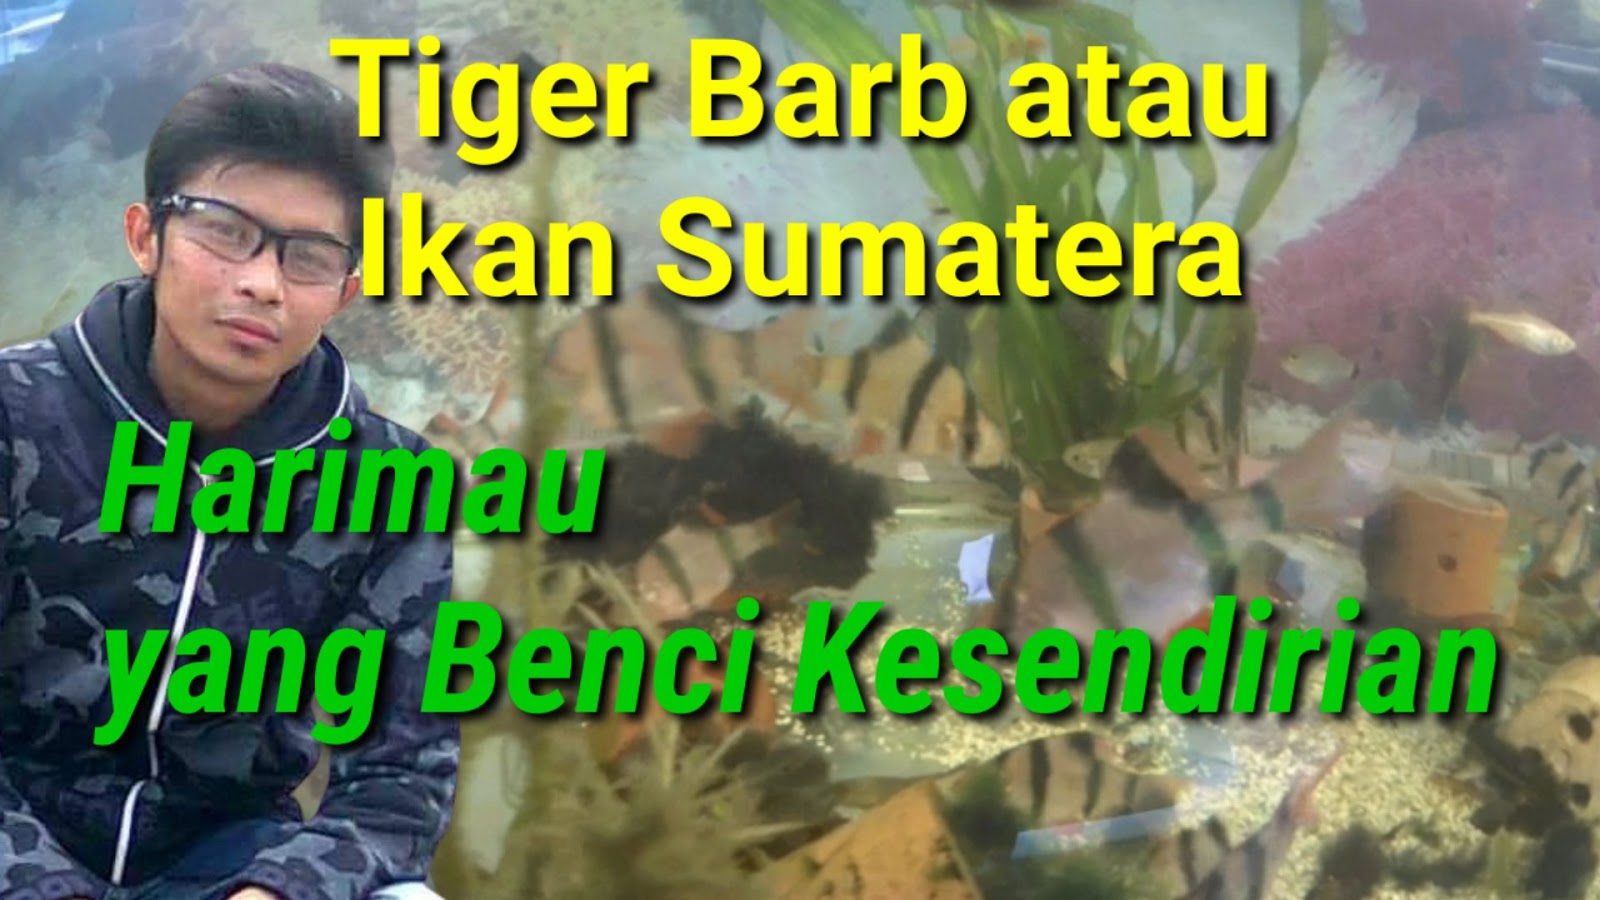 Ikan Tiger Barb atau Ikan Sumatera,Harimau yang Benci Kesendirian